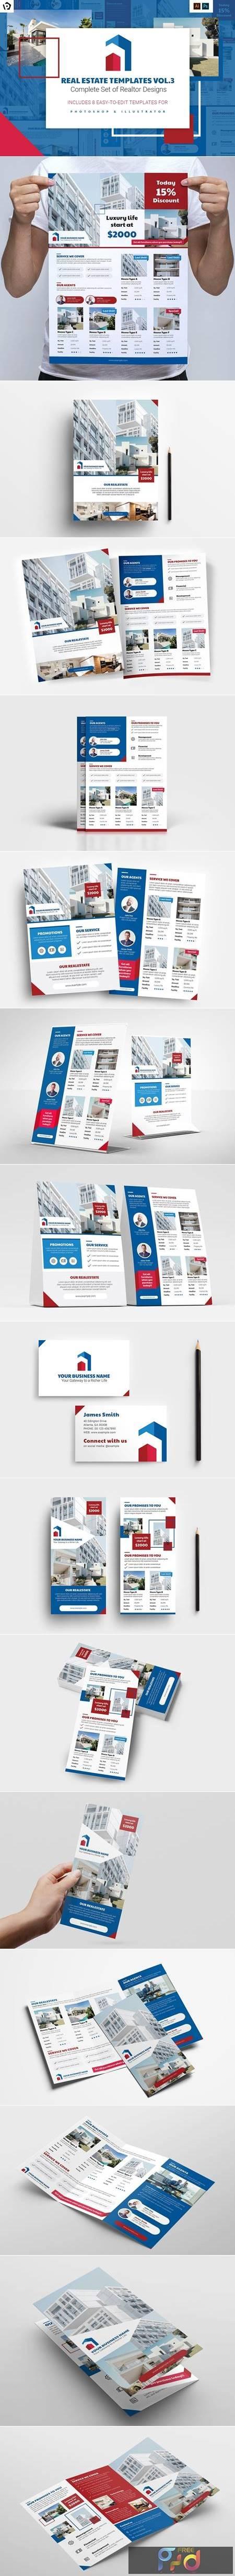 Real Estate Templates Pack Vol.3 4410440 1